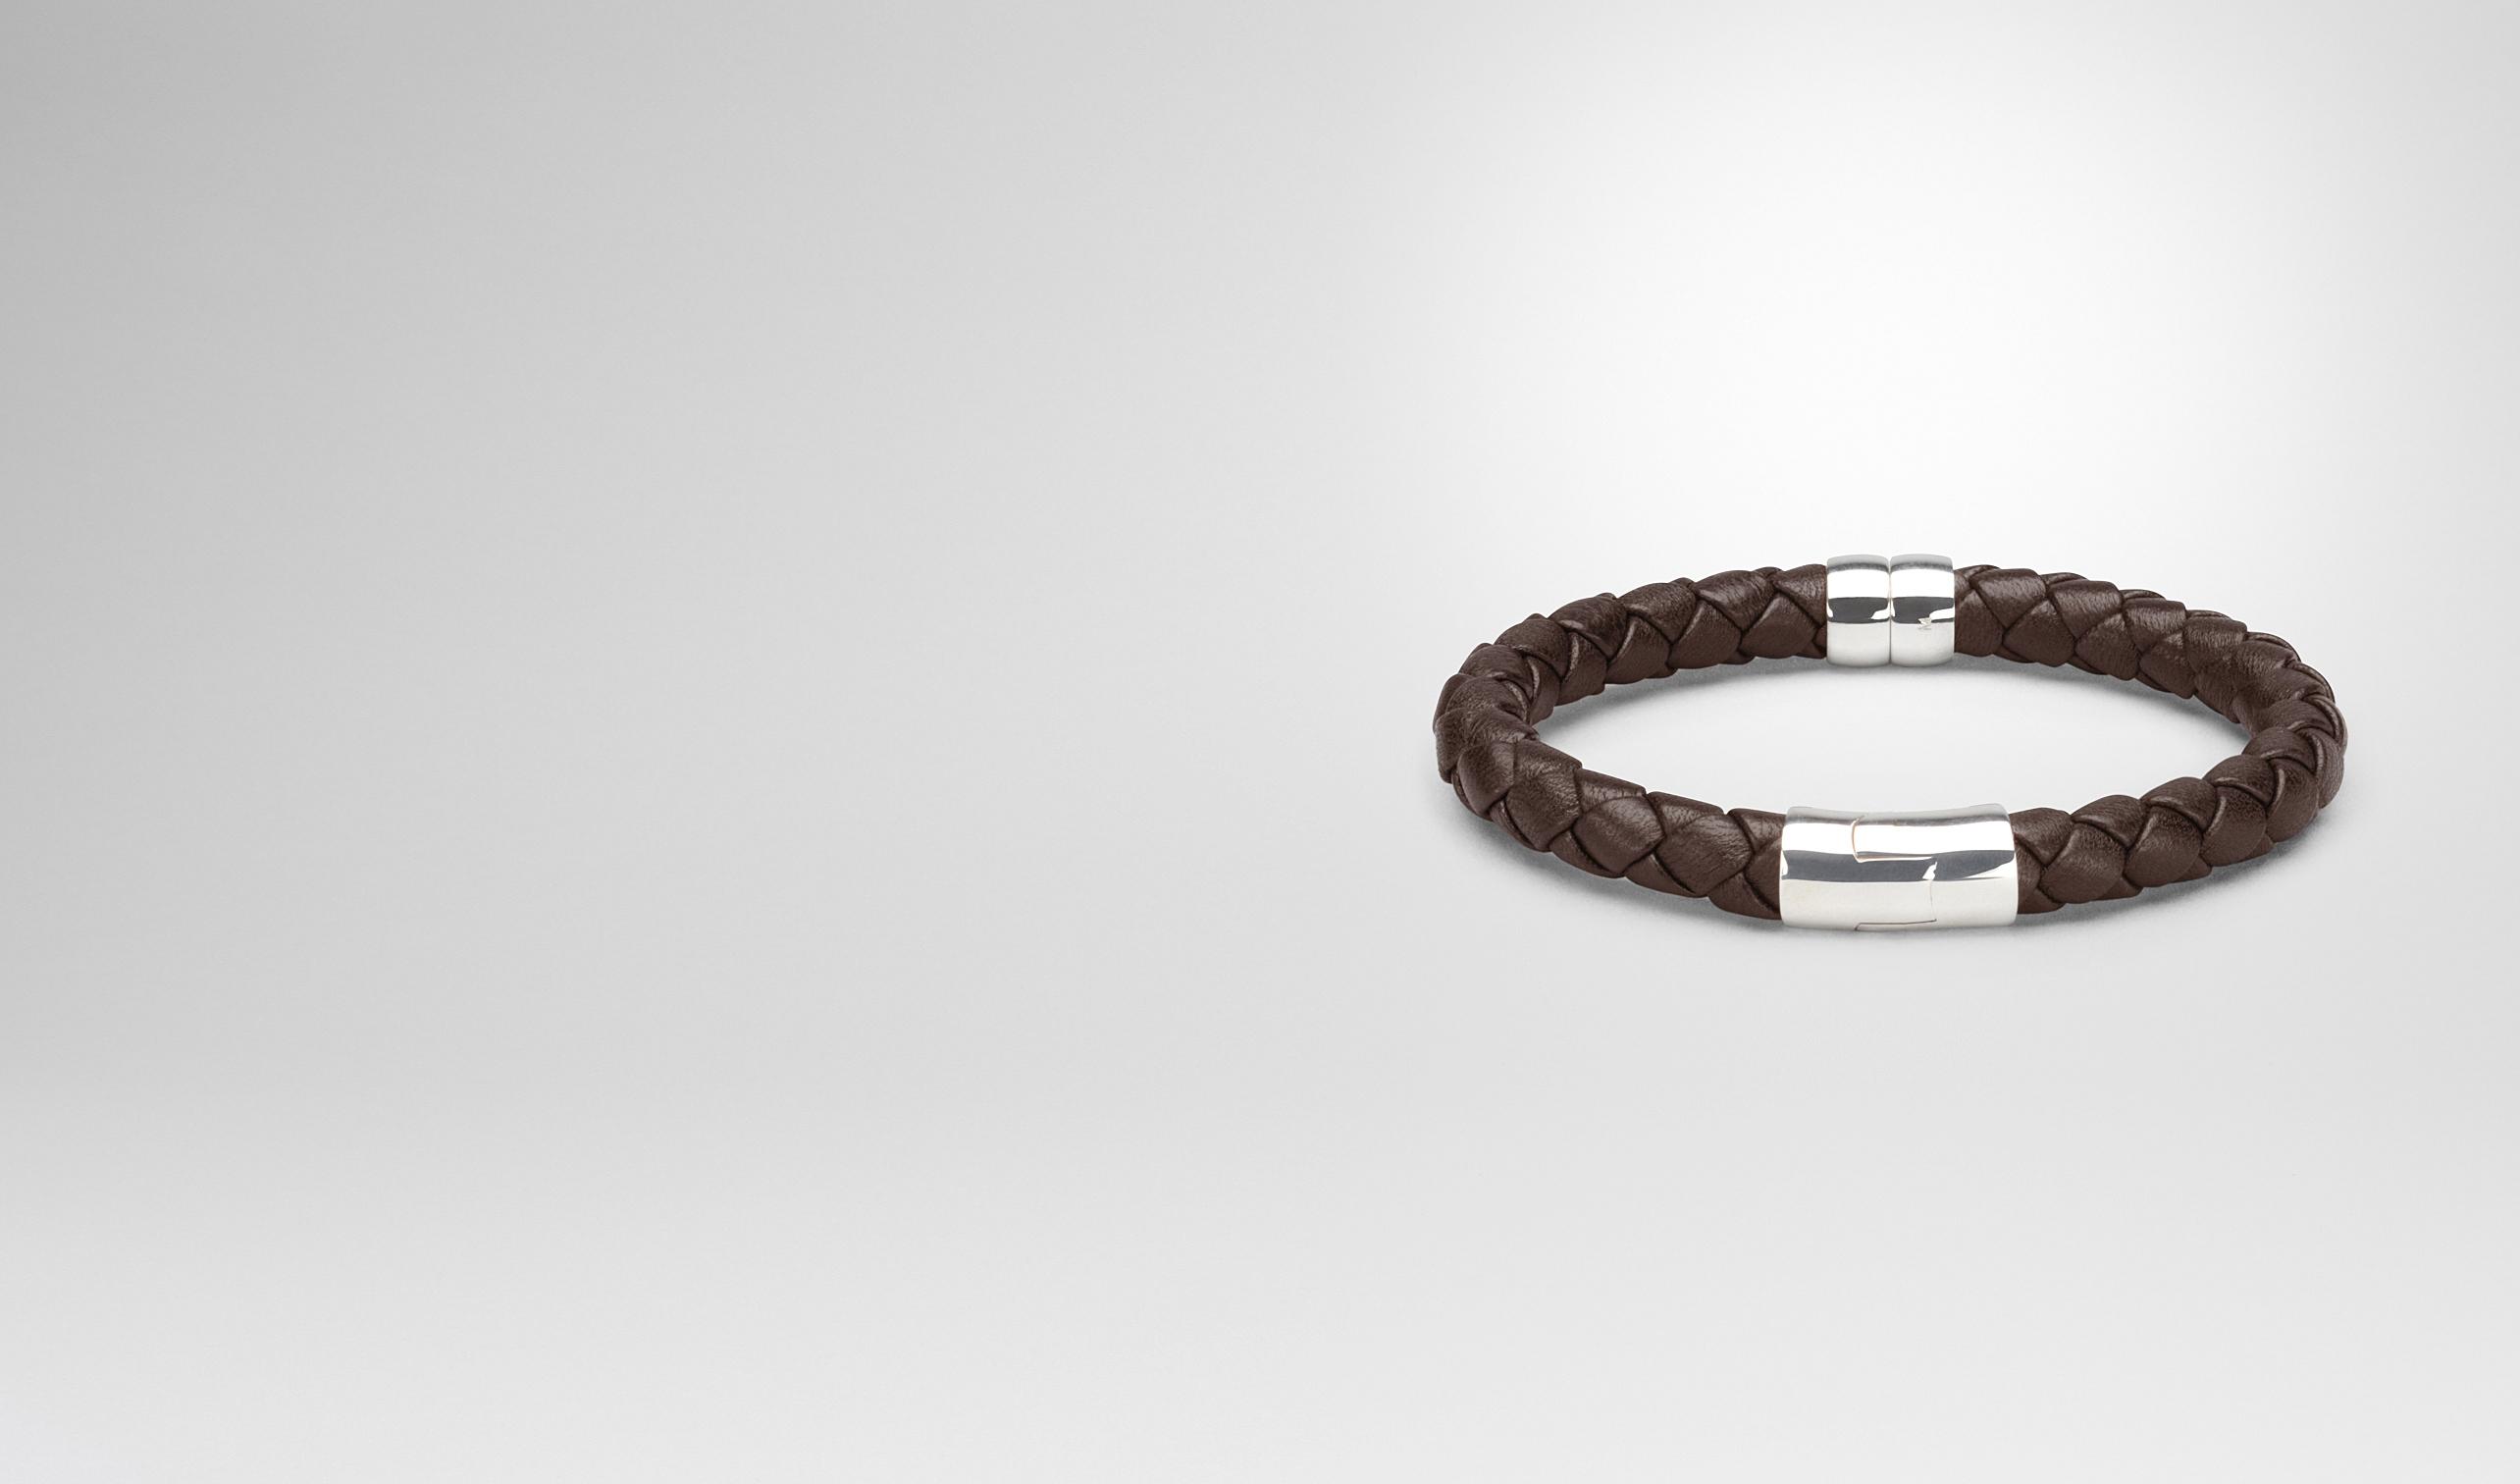 BOTTEGA VENETA Armband U Armband aus SILBER ANTIQUE und Nappaleder Intrecciato Ebano pl